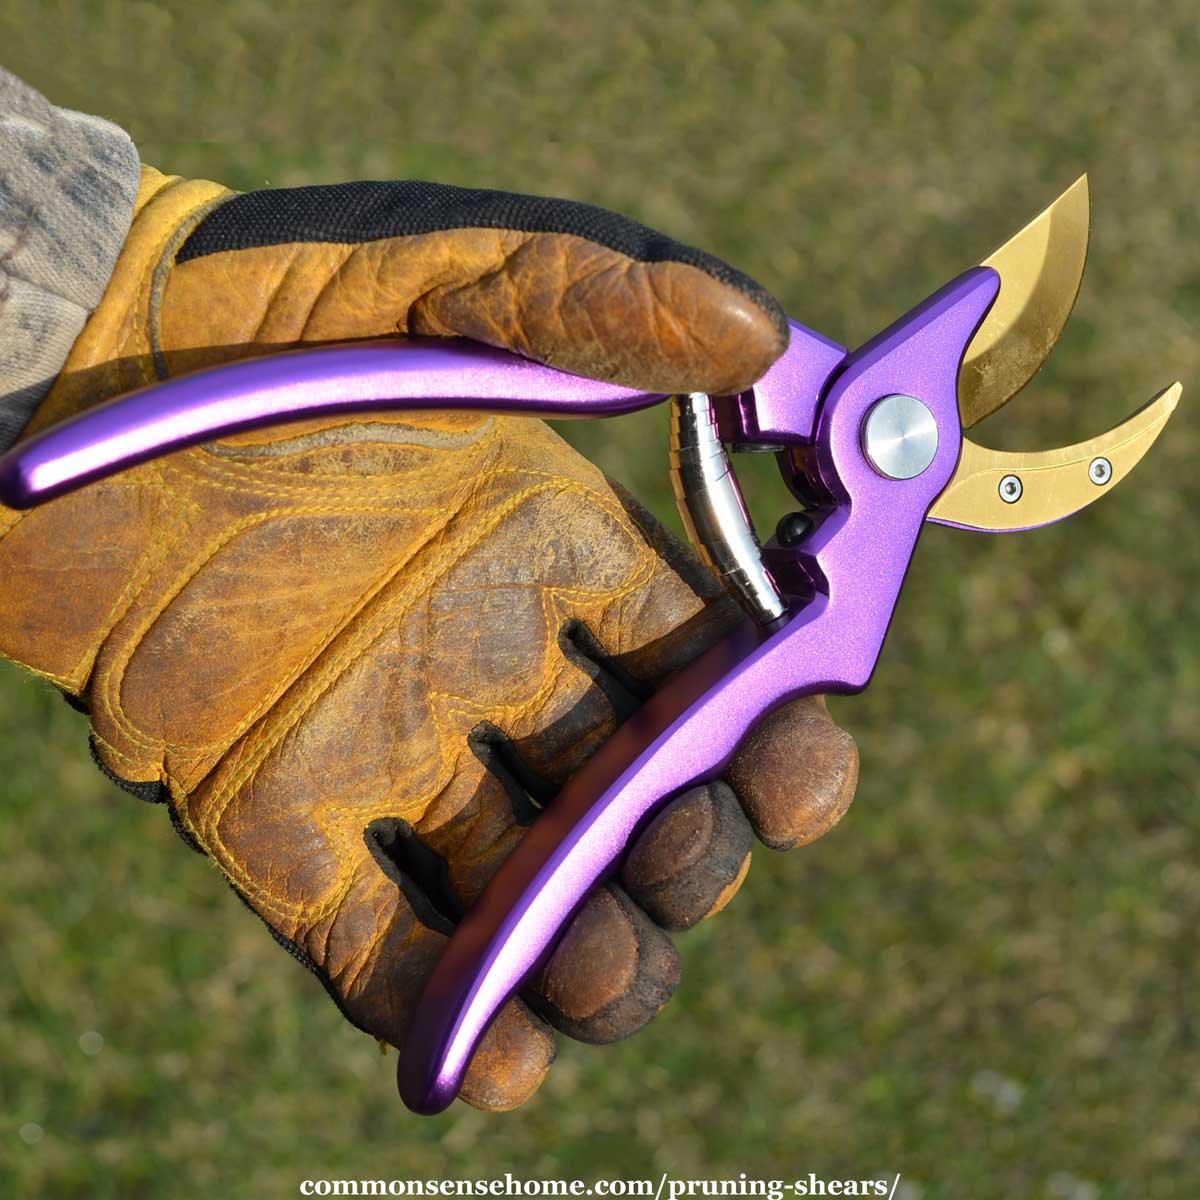 purple pruning shears